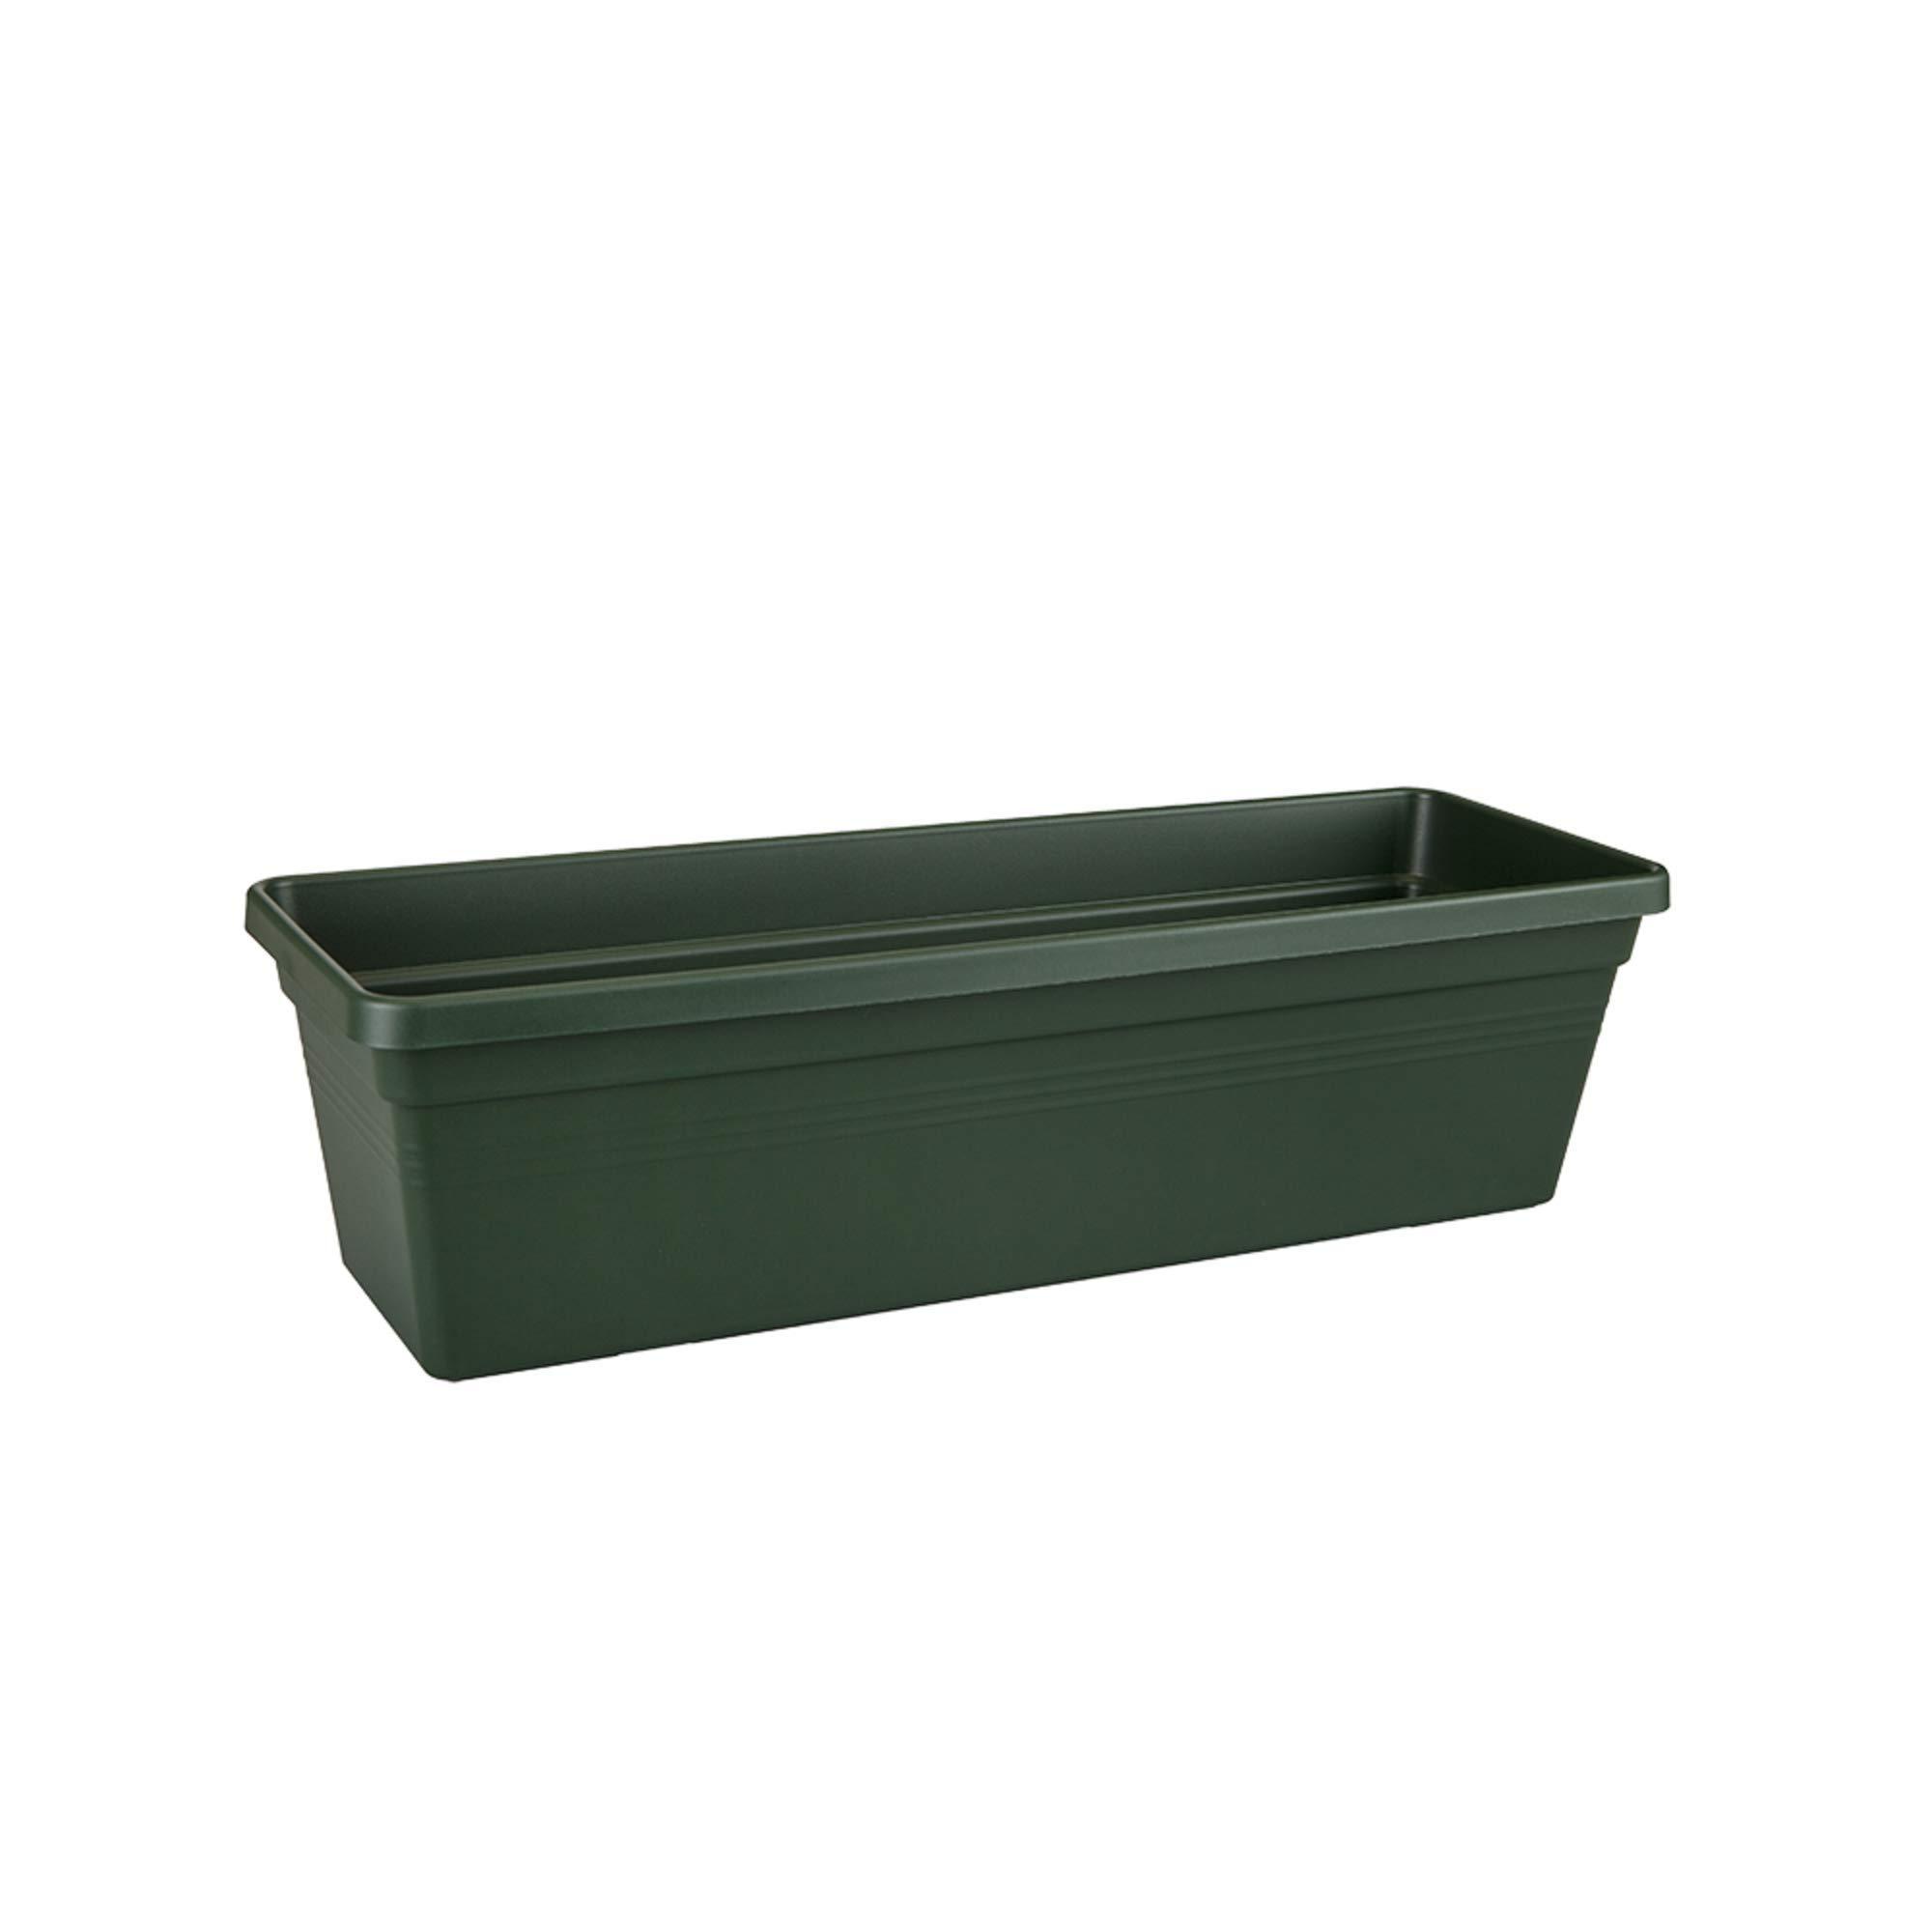 Elho Basics Trough Jardinera, 6 litros, Verde(Leaf Green), 39×16,5×13,7 cm